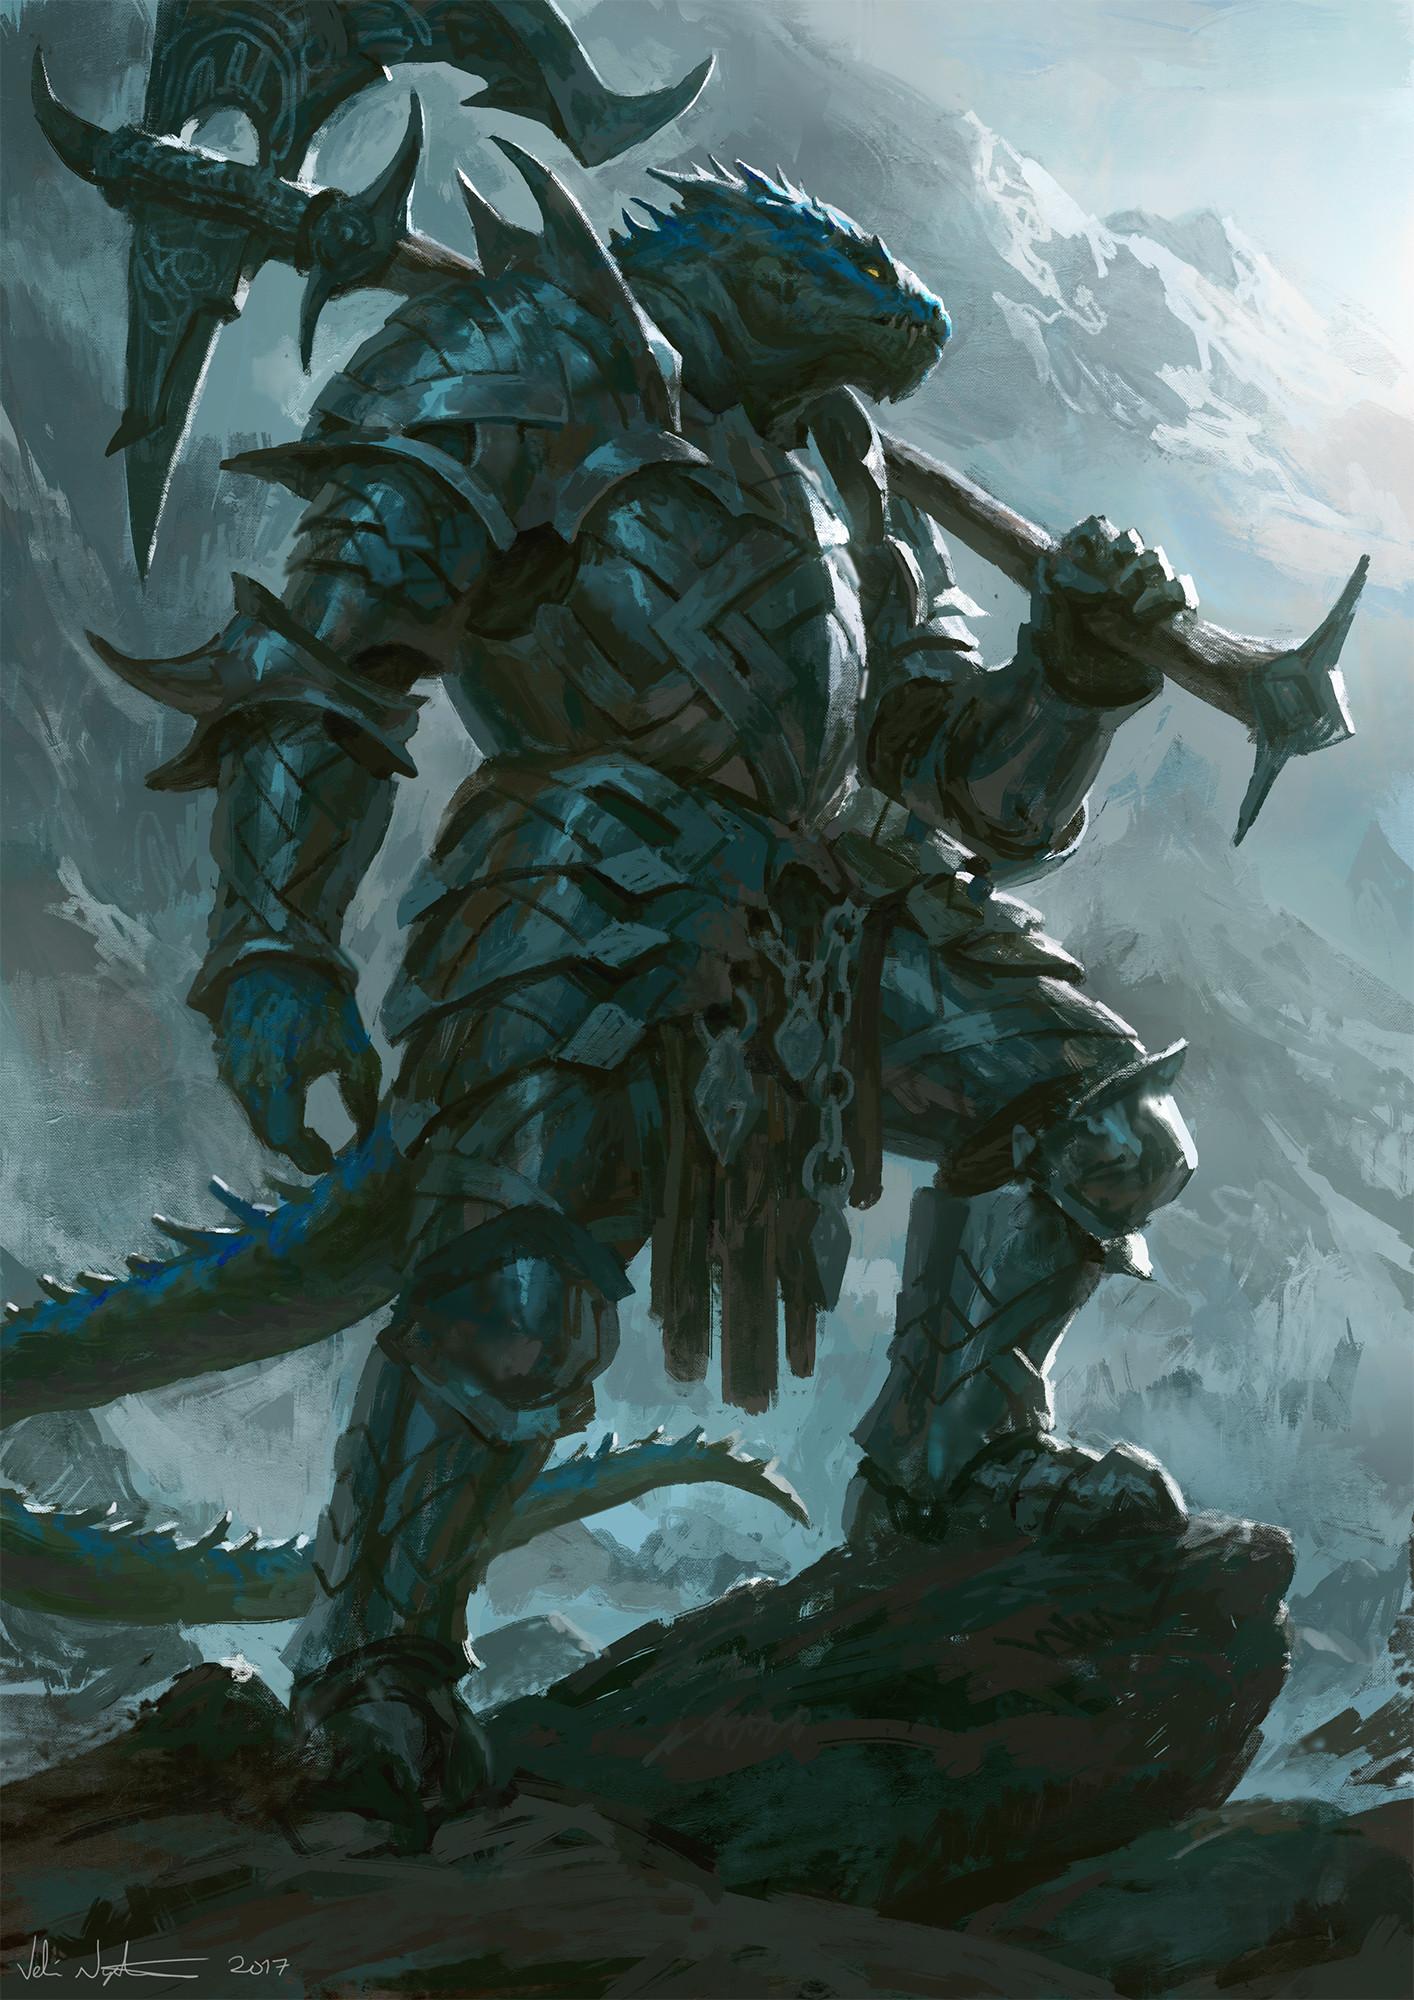 Veli nystrom lizard warrior